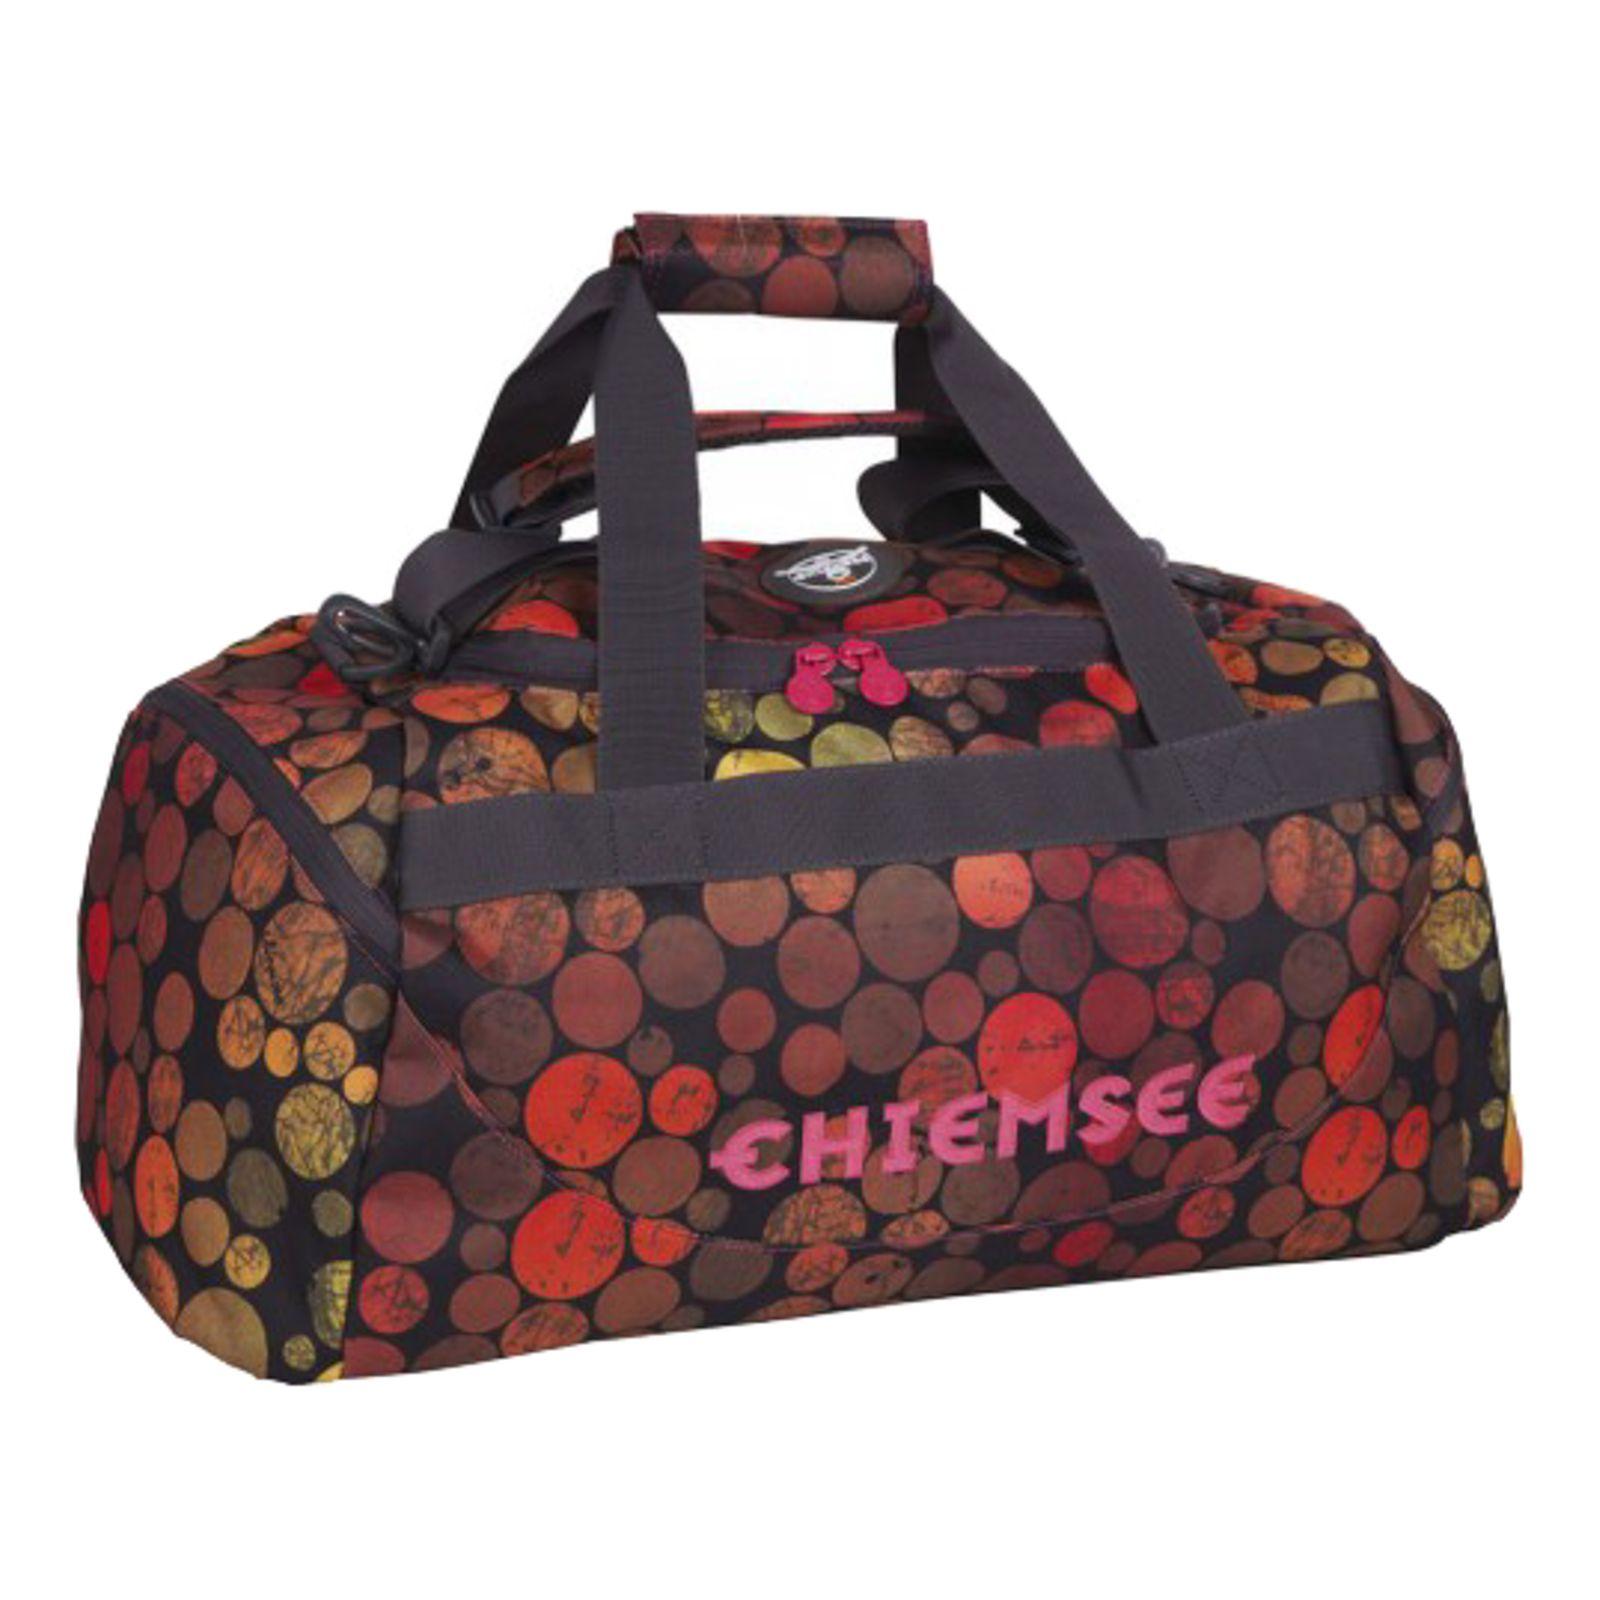 CHIEMSEE Sport Matchbag Medium Dots Black